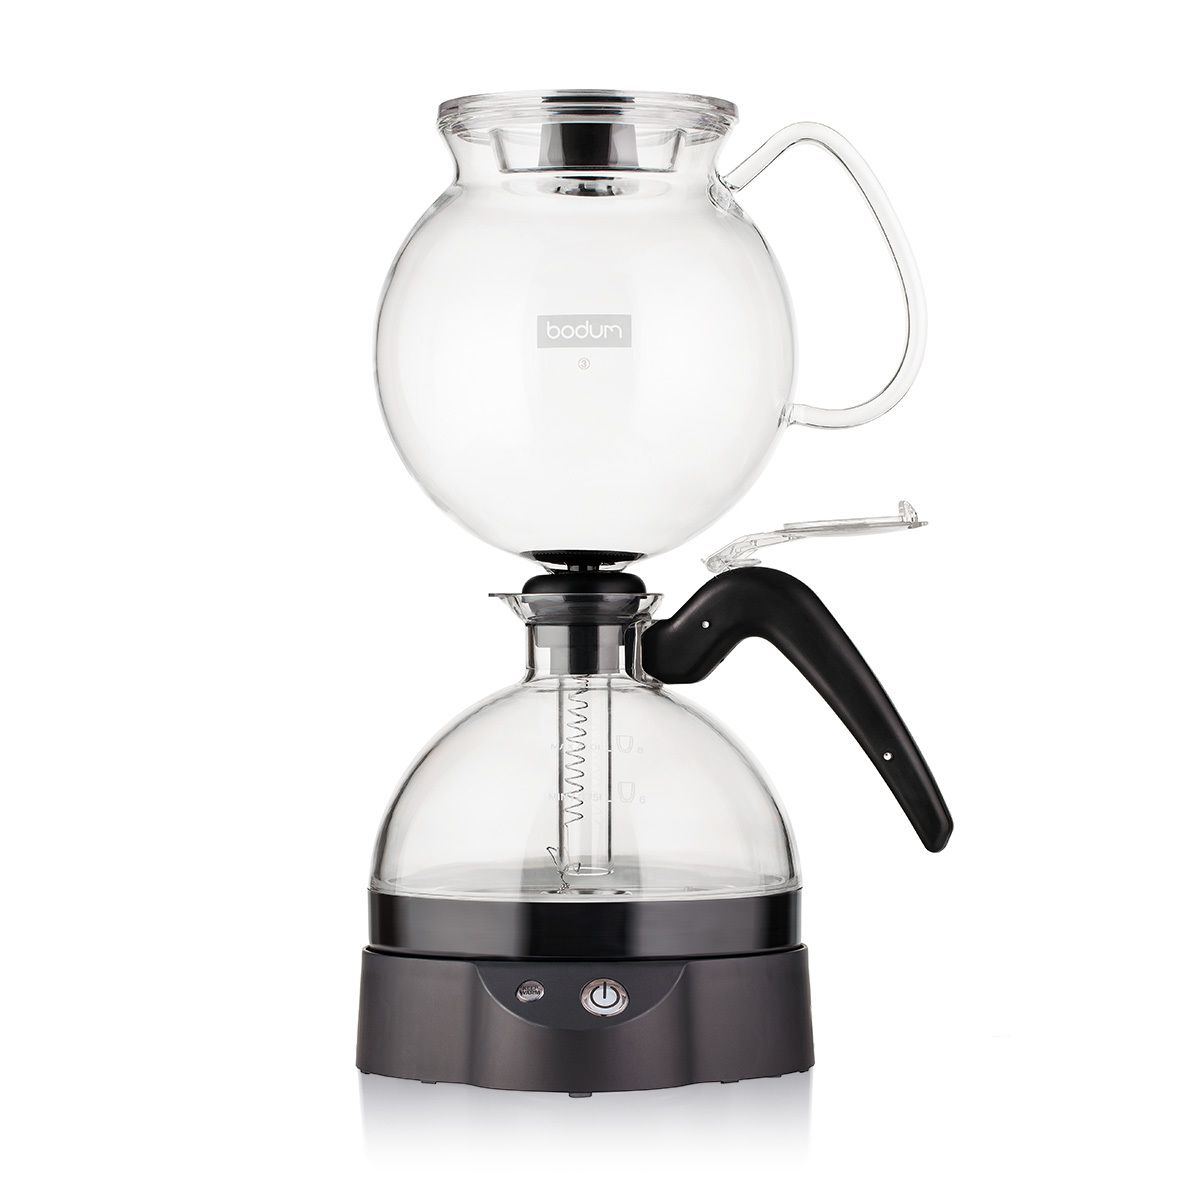 siphon coffee maker Bodum